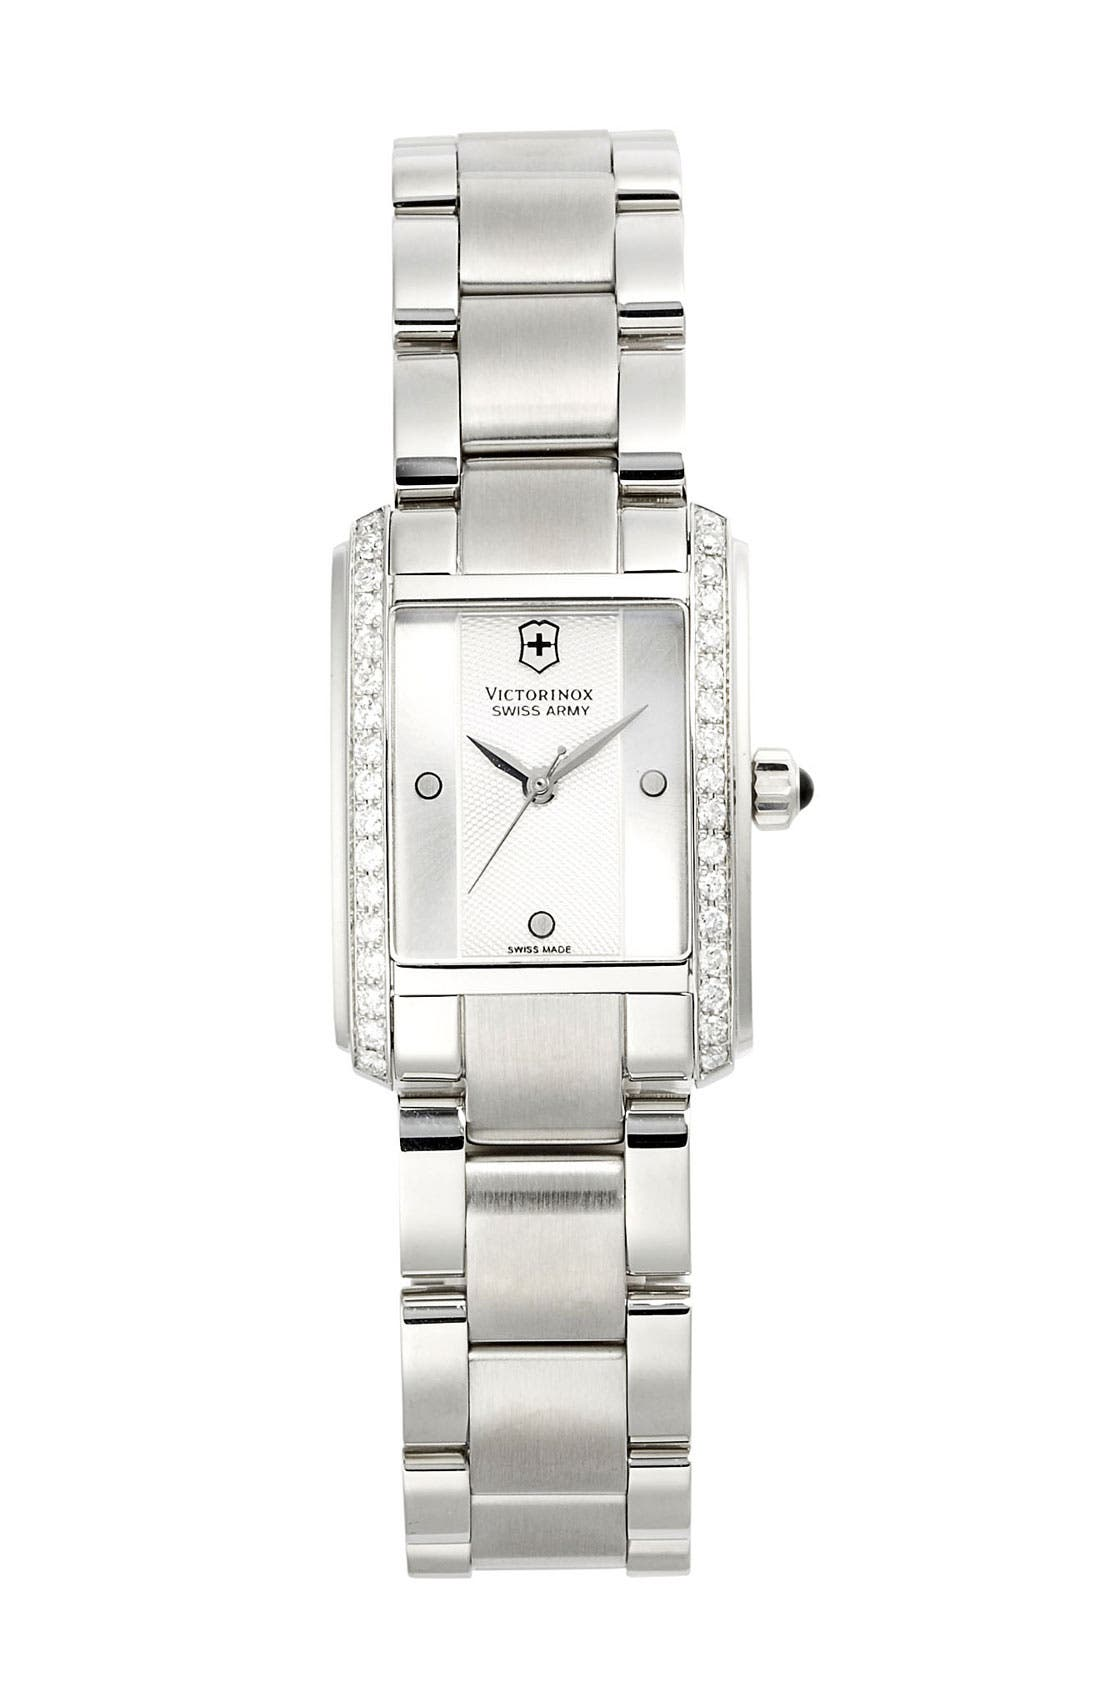 Alternate Image 1 Selected - Victorinox Swiss Army® 'Vivante' Rectangular Diamond Case Bracelet Watch, 21mm x 30mm